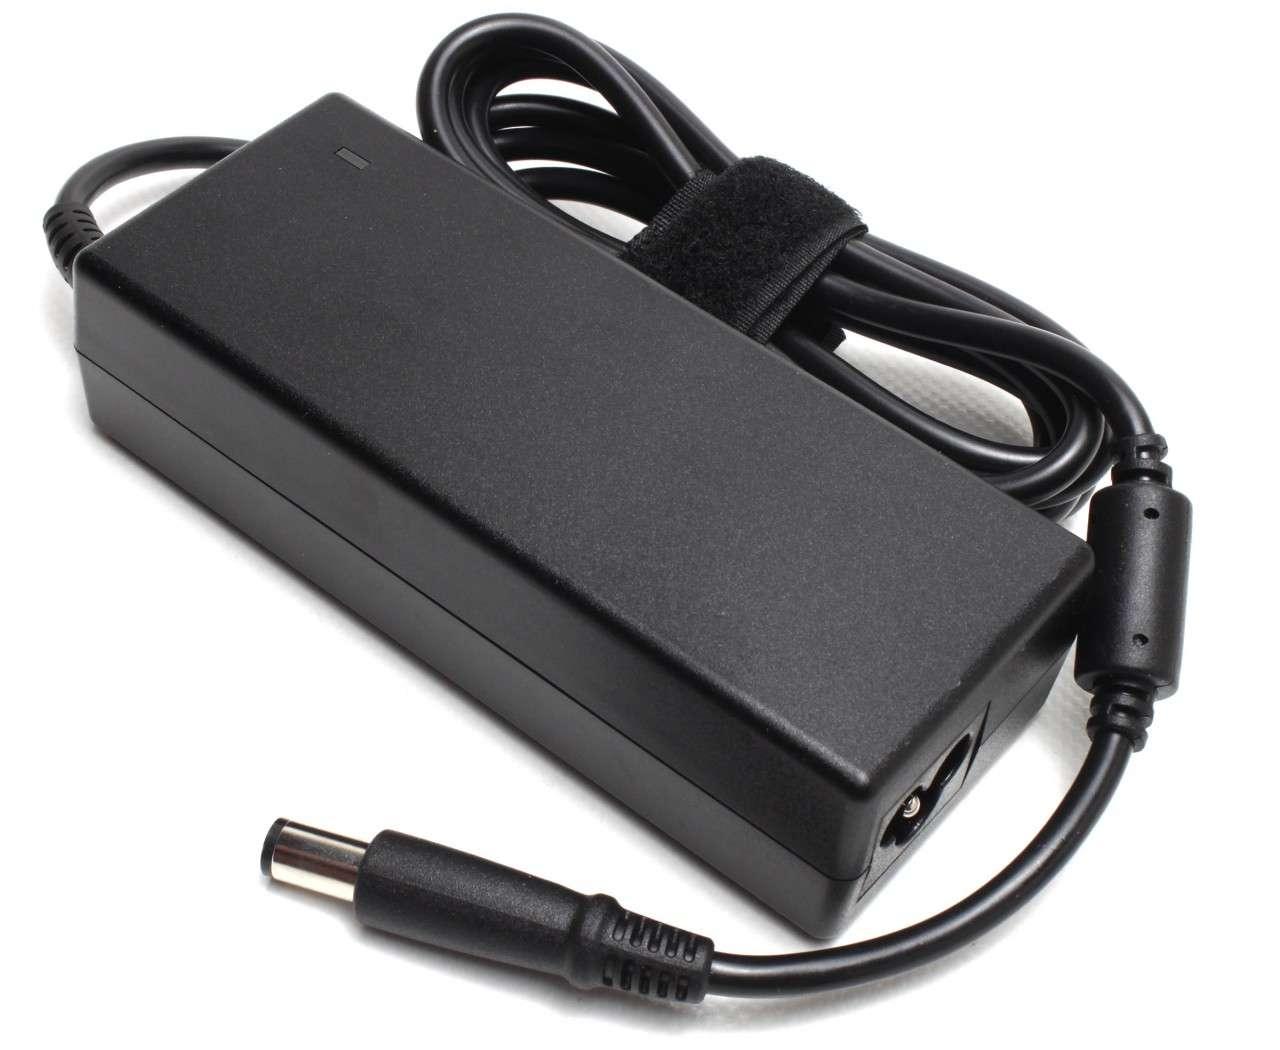 Incarcator Dell 14 Rugged 5404 VARIANTA 3 imagine powerlaptop.ro 2021